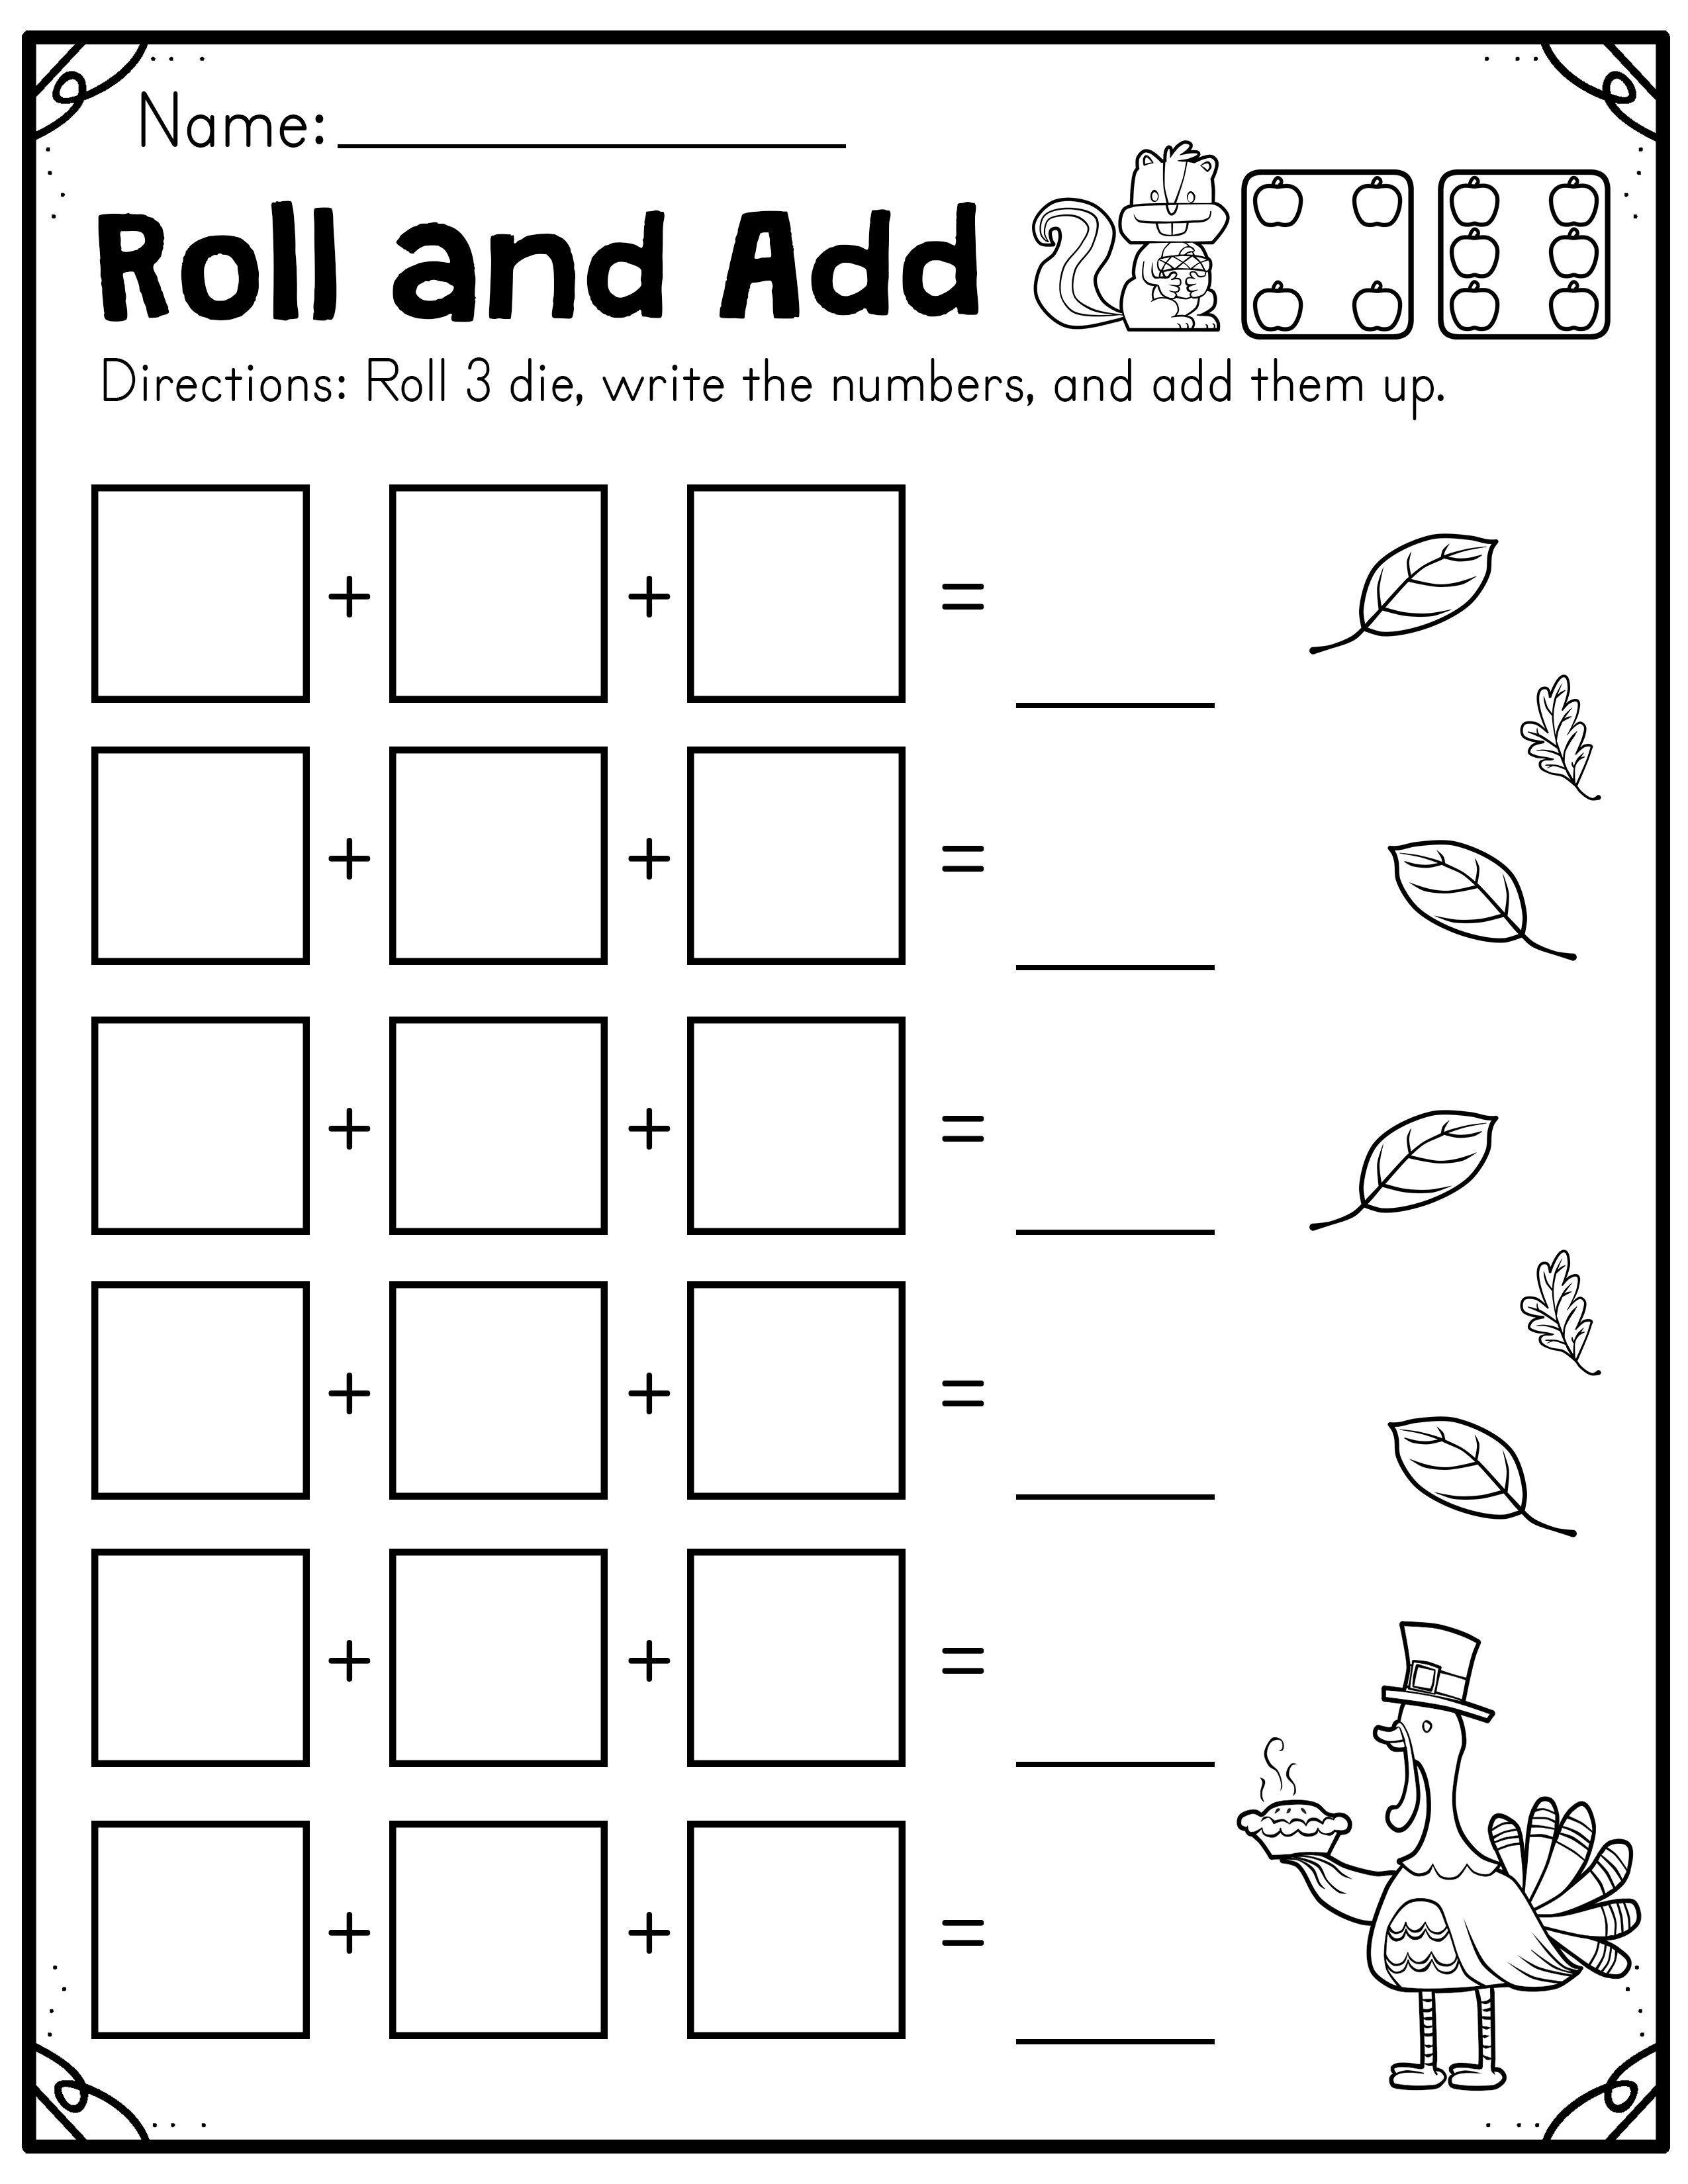 Fall Roll And Add Worksheet First Grade Made By Teachers Kindergarten Math Worksheets Free First Grade Worksheets Fall Worksheets